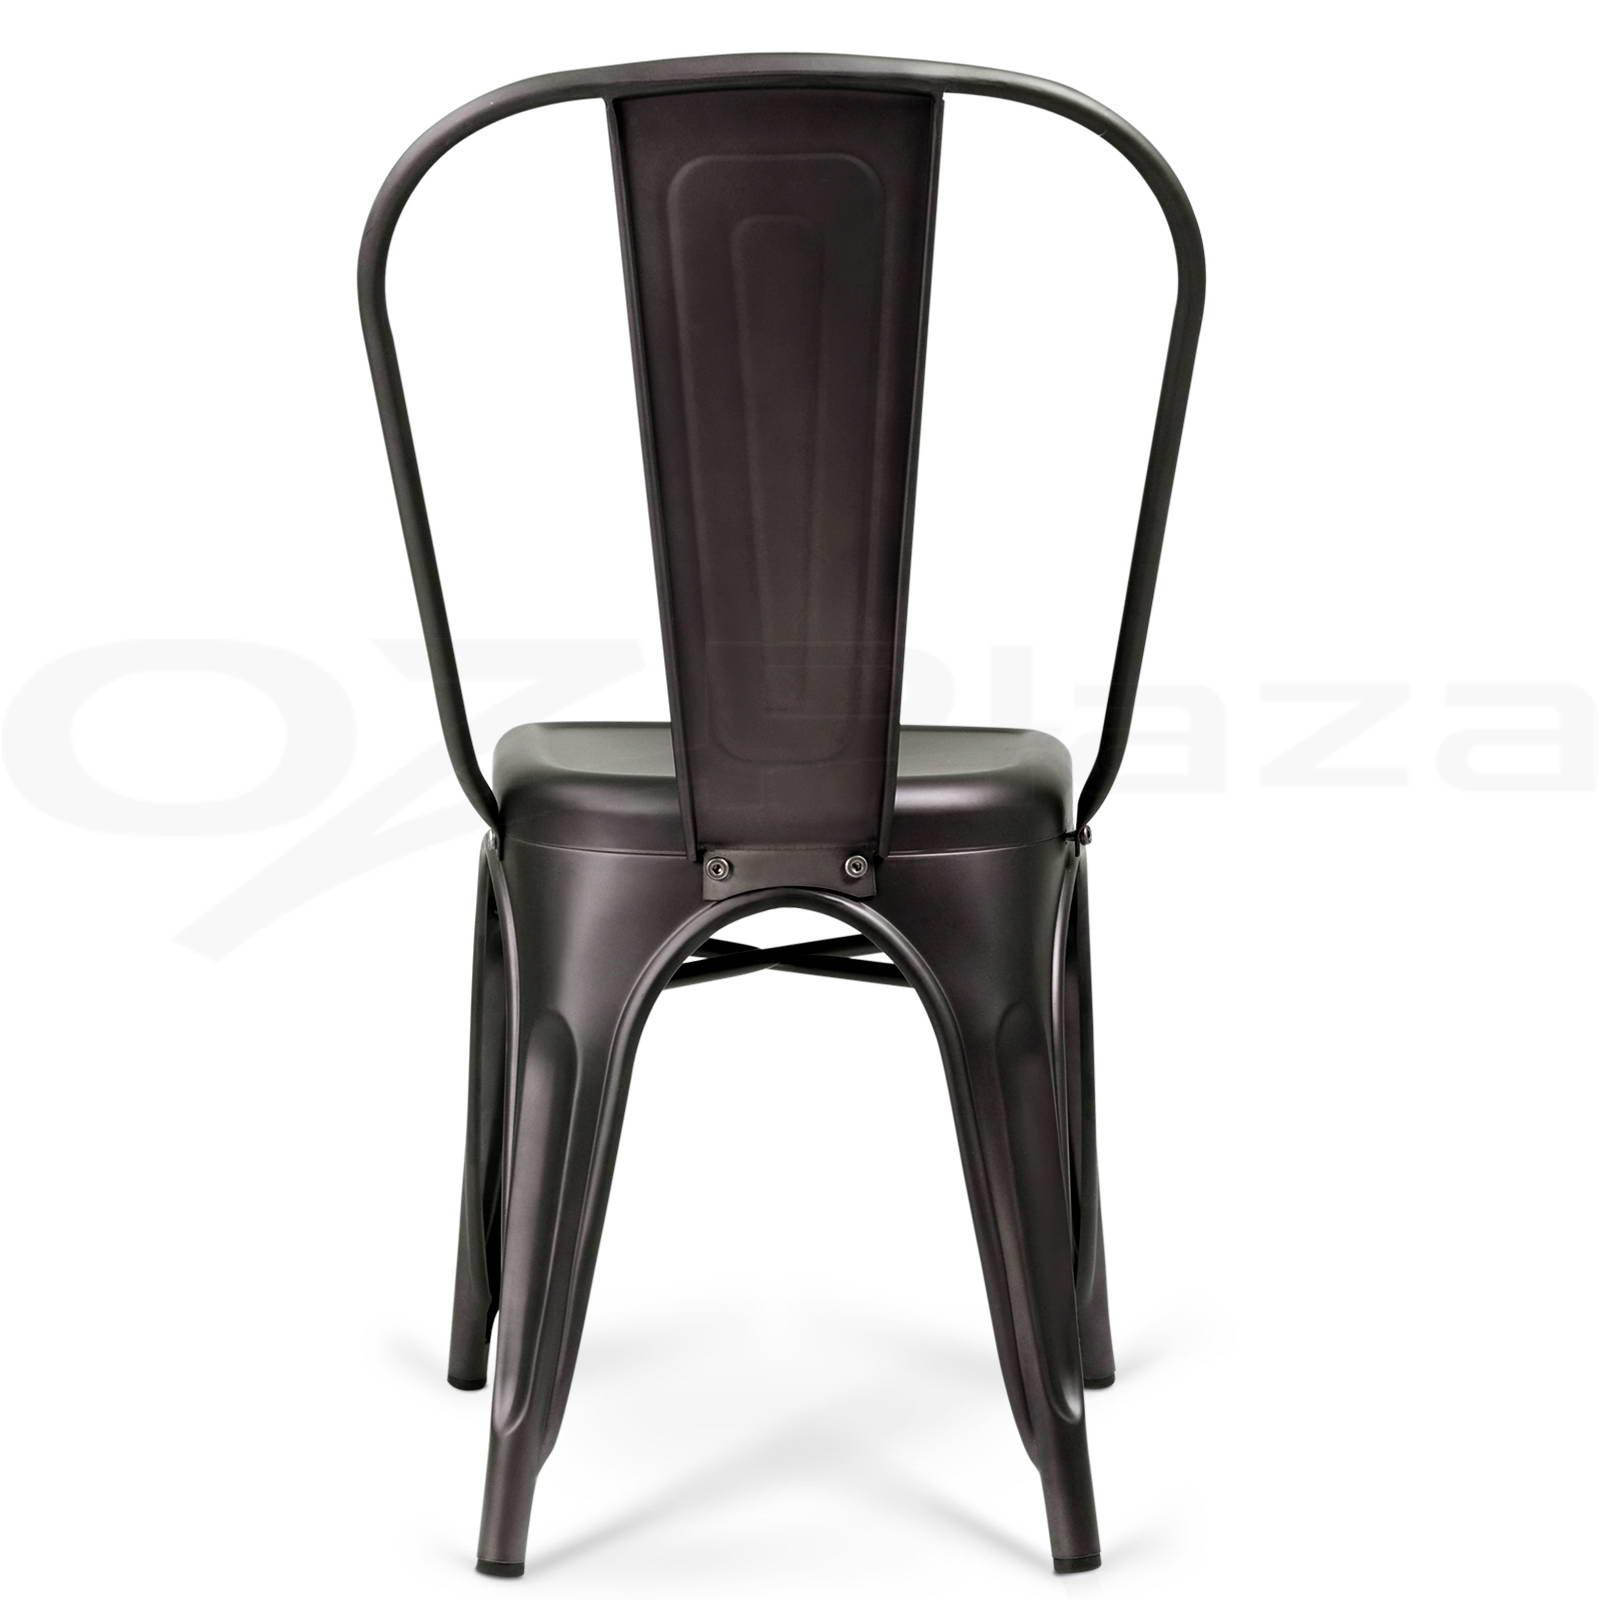 4 x Replica Tolix Dining Chair Metal Steel Xavier Bar Stool Home